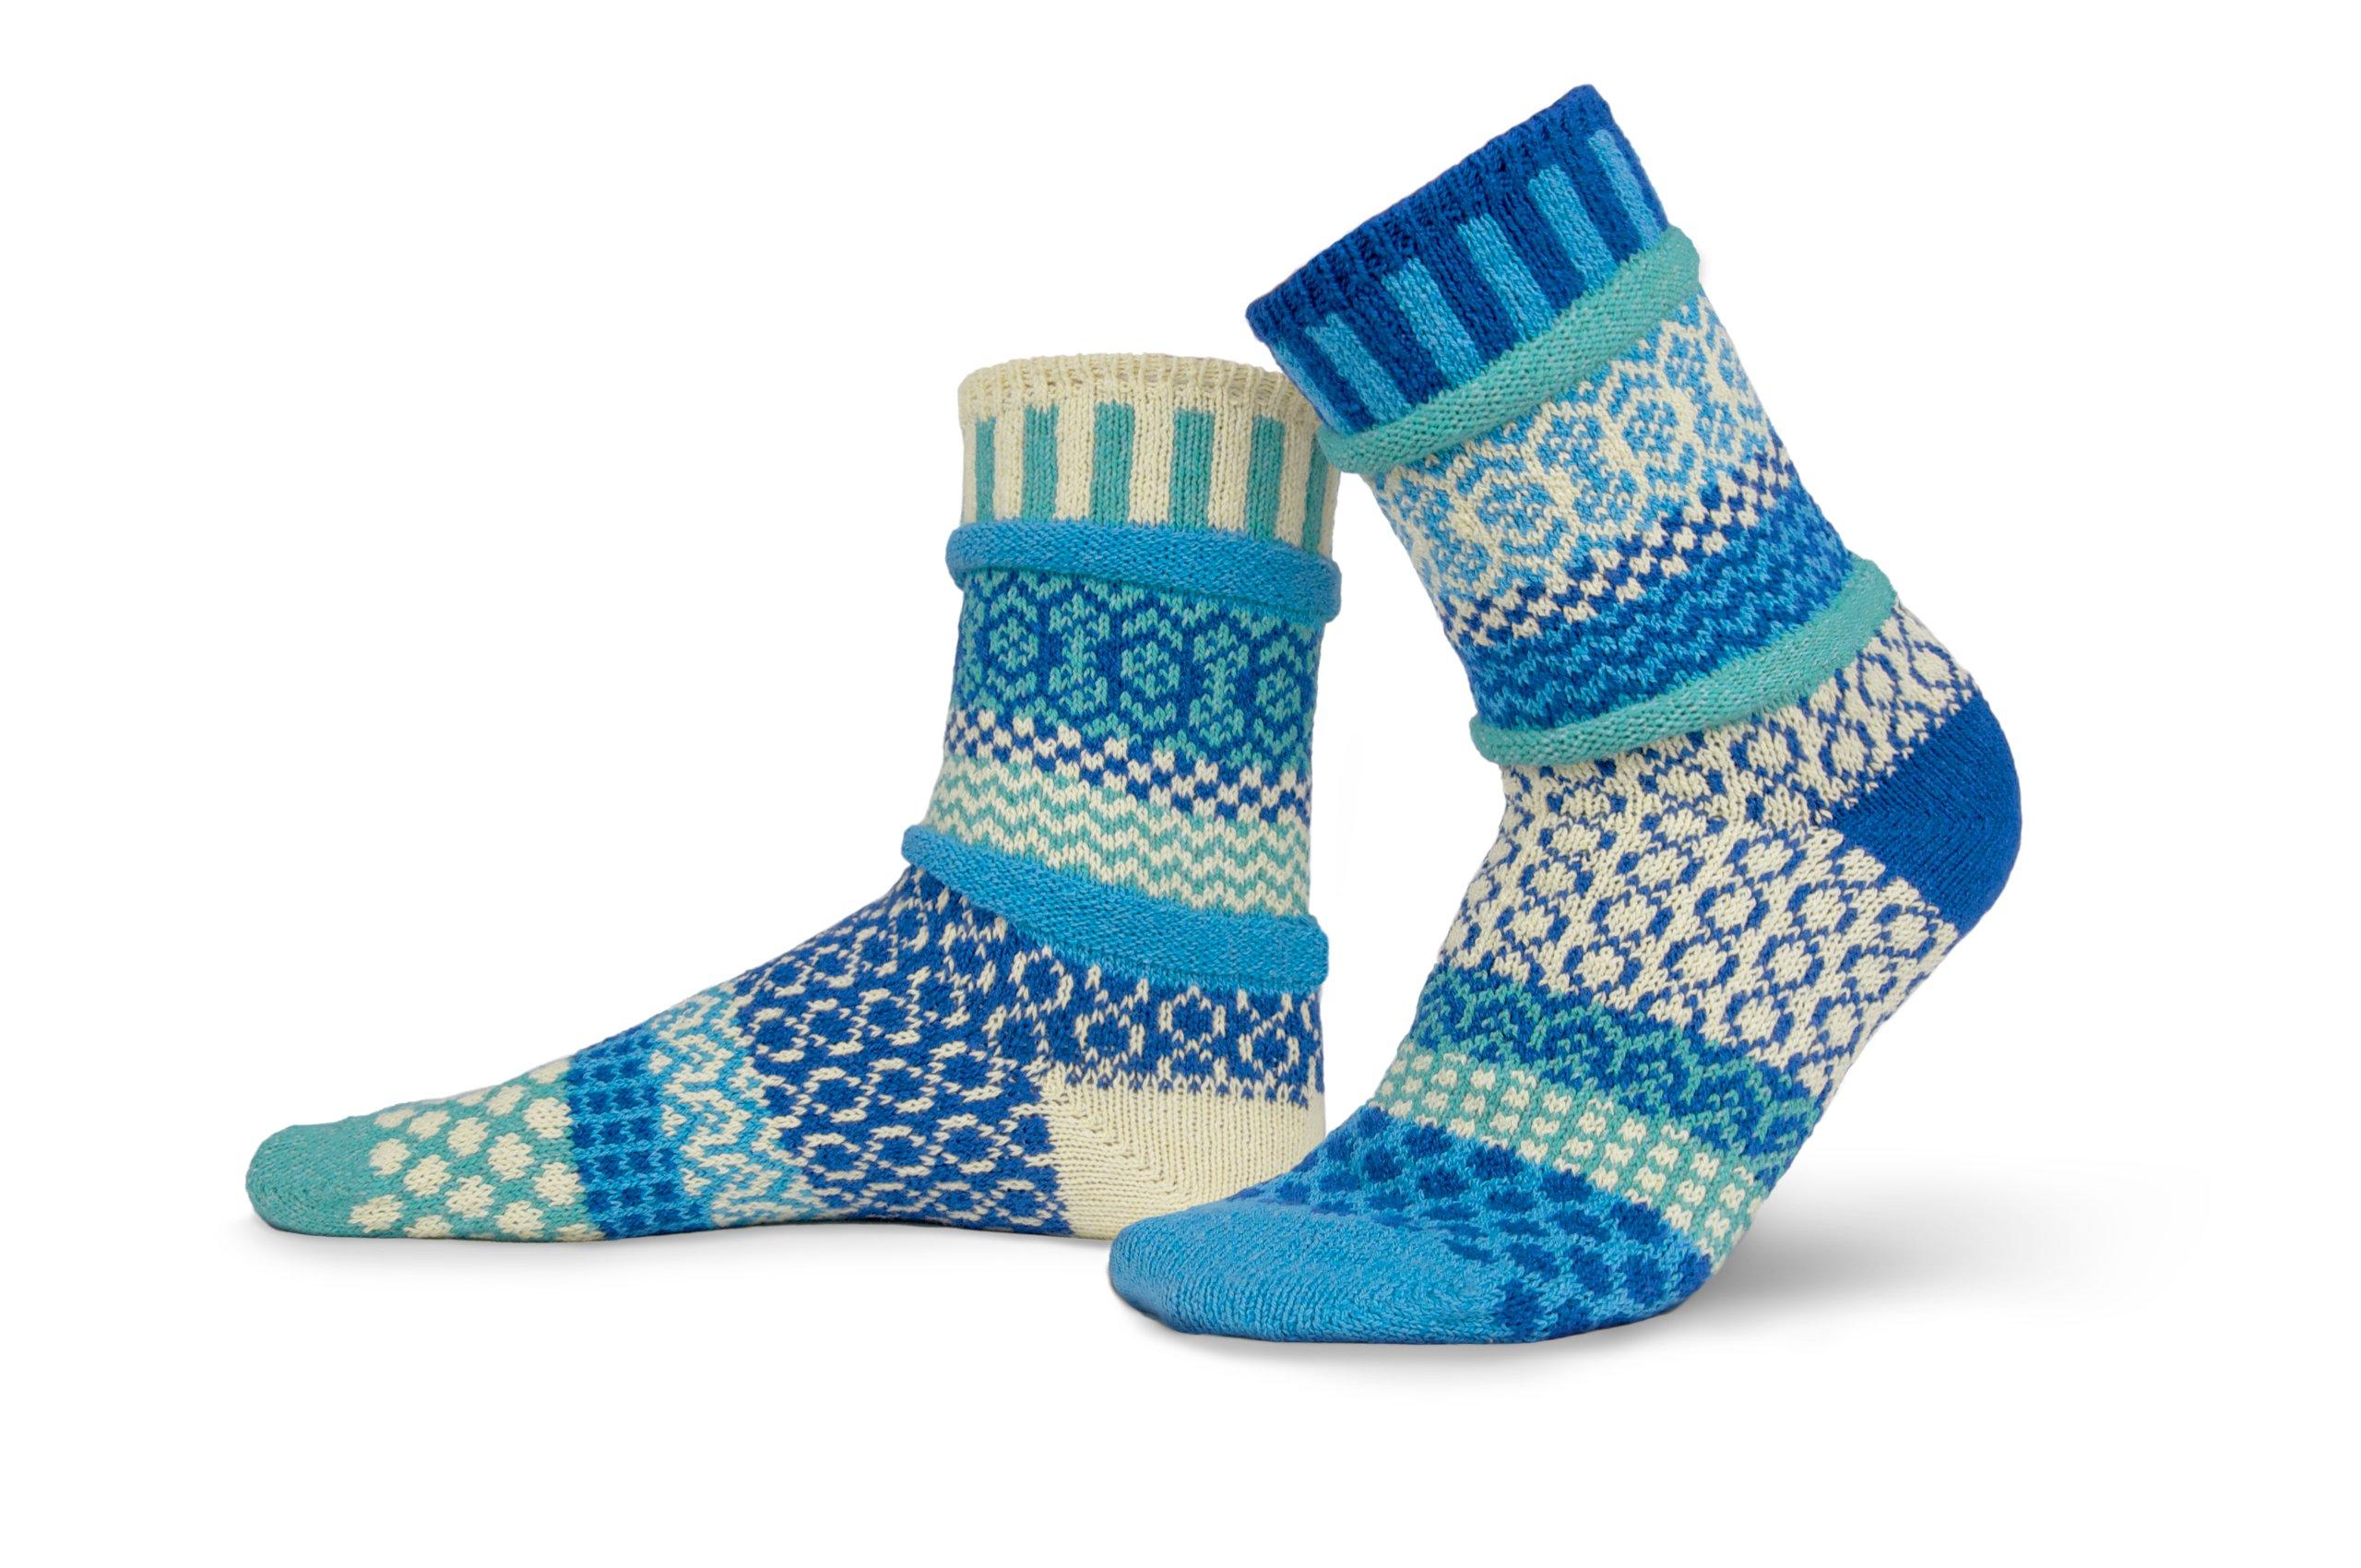 Solmate Socks - Mismatched Crew Socks; Made in USA; Zephyr Large